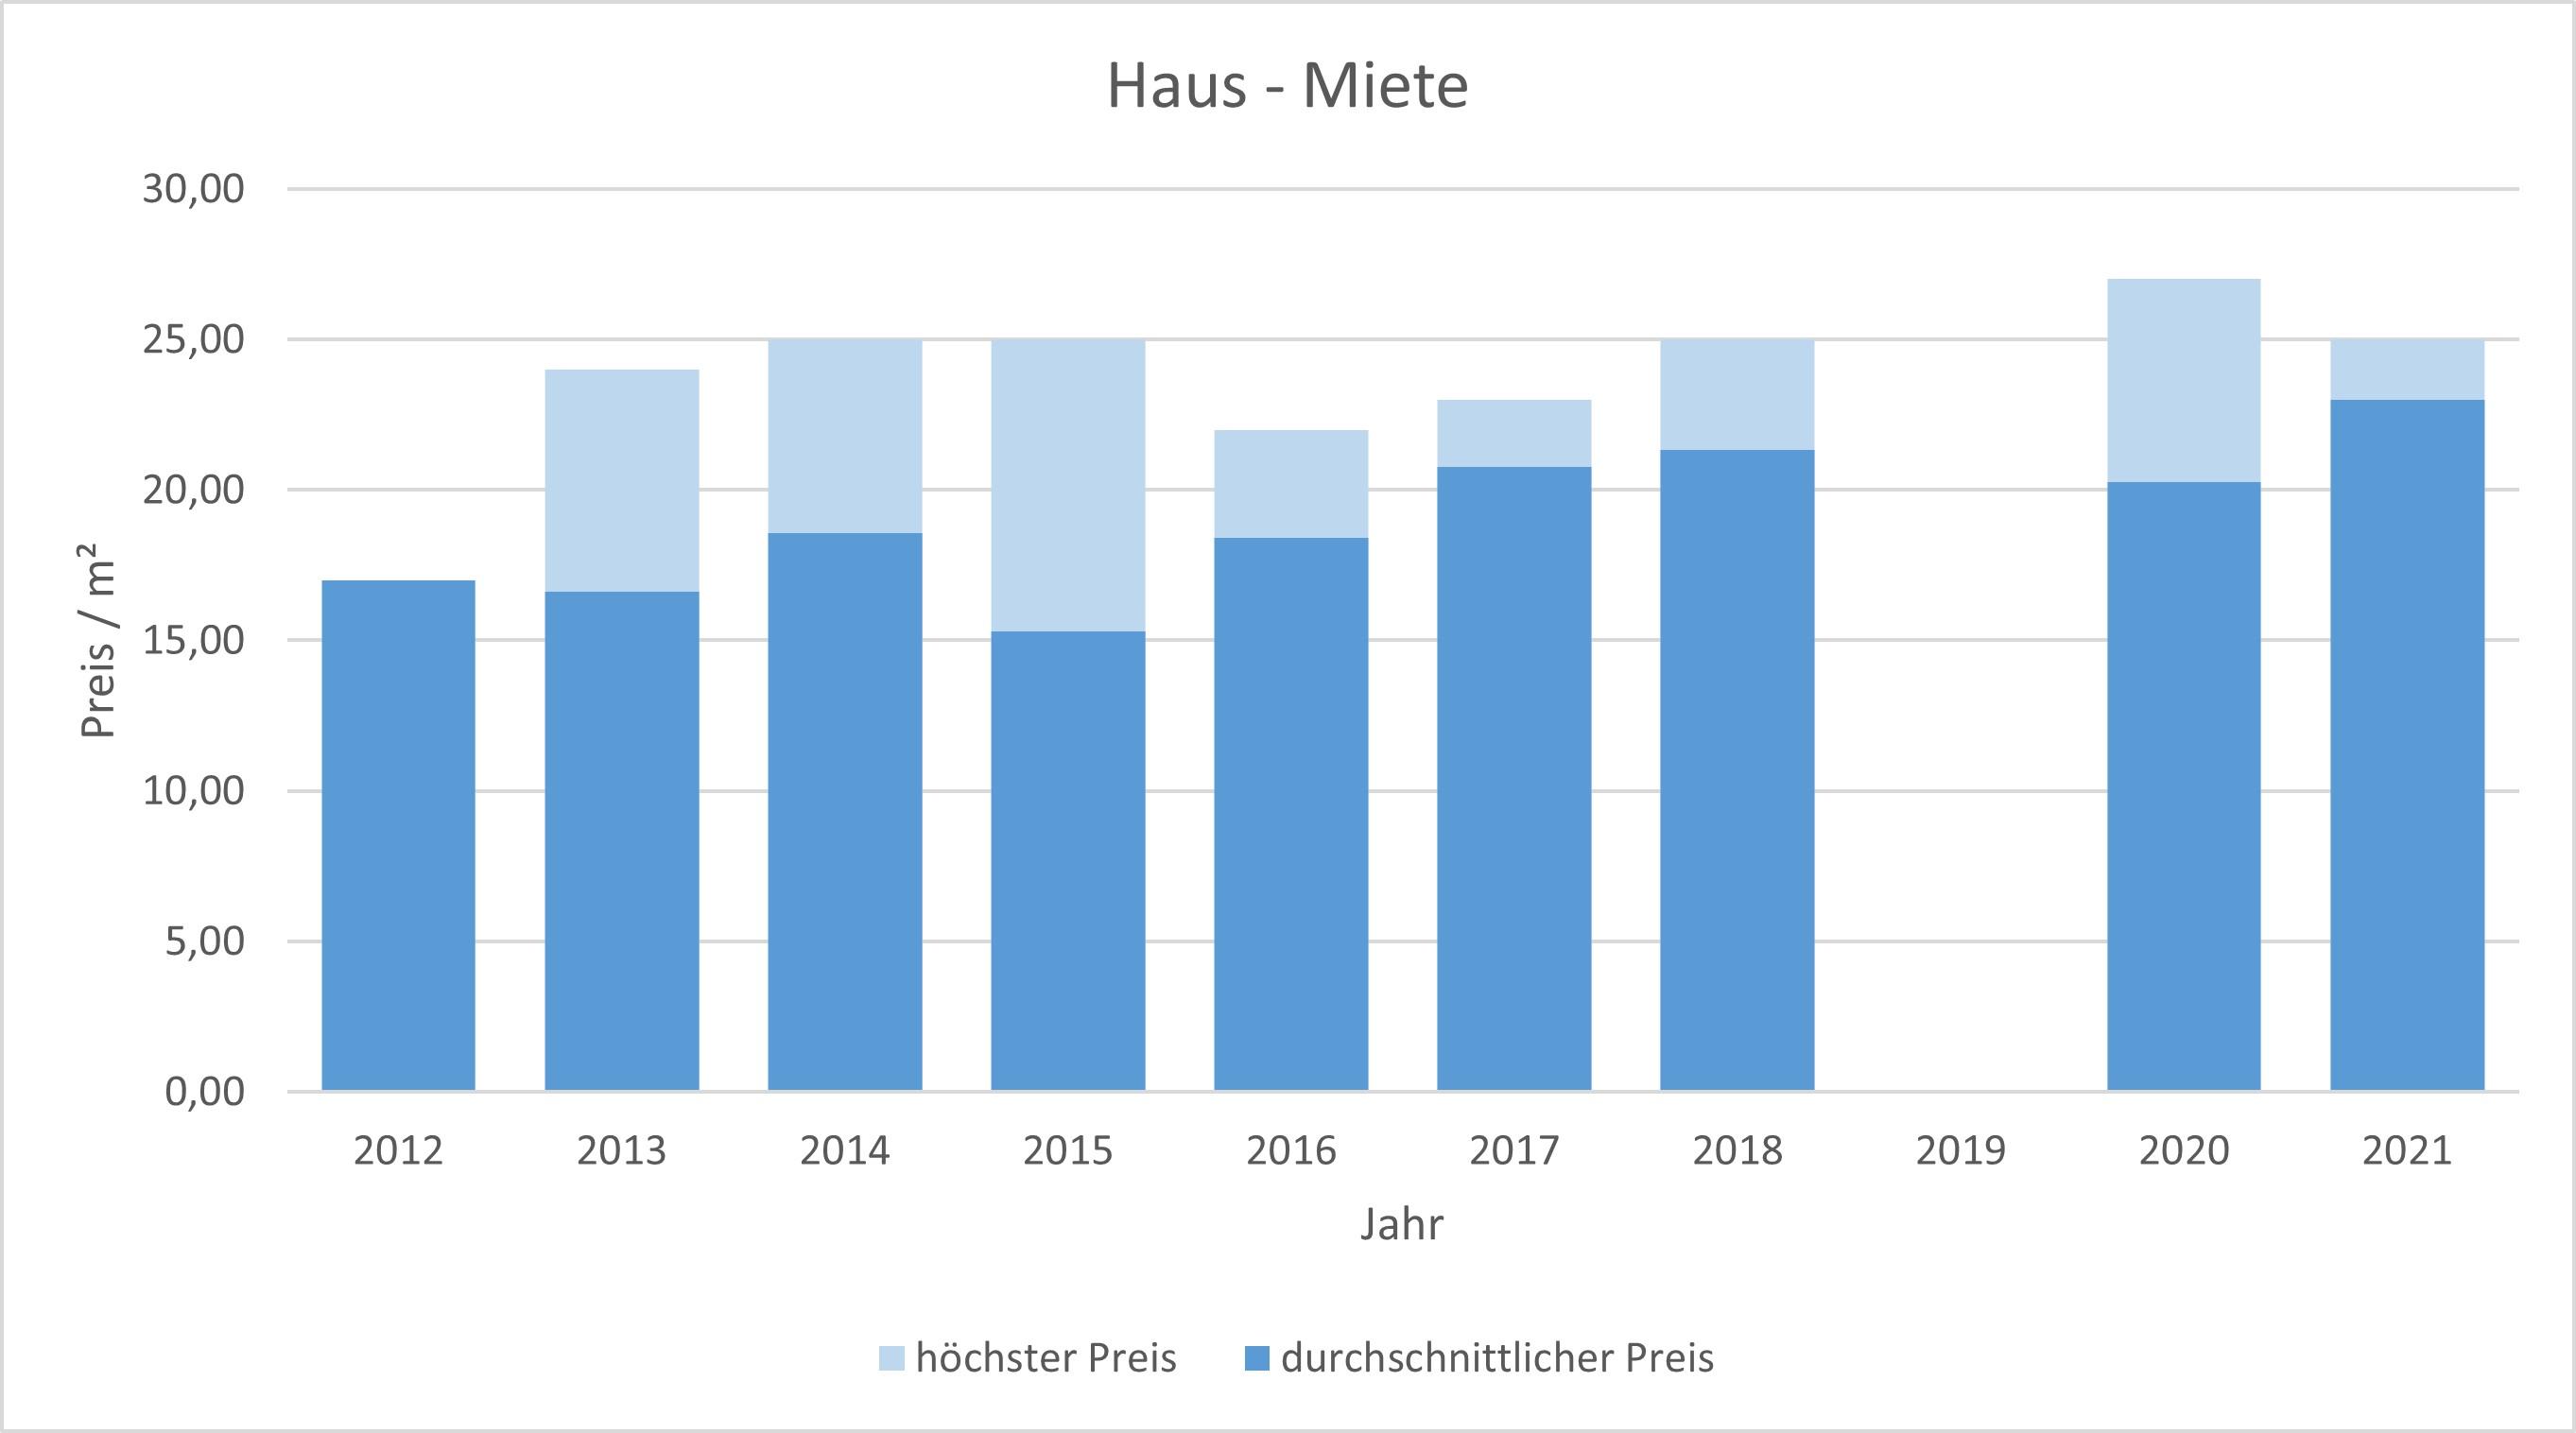 München - Ludwigvorstadt Haus mieten vermieten Preis Bewertung Makler 2019 2020 2021 www.happy-immo.de